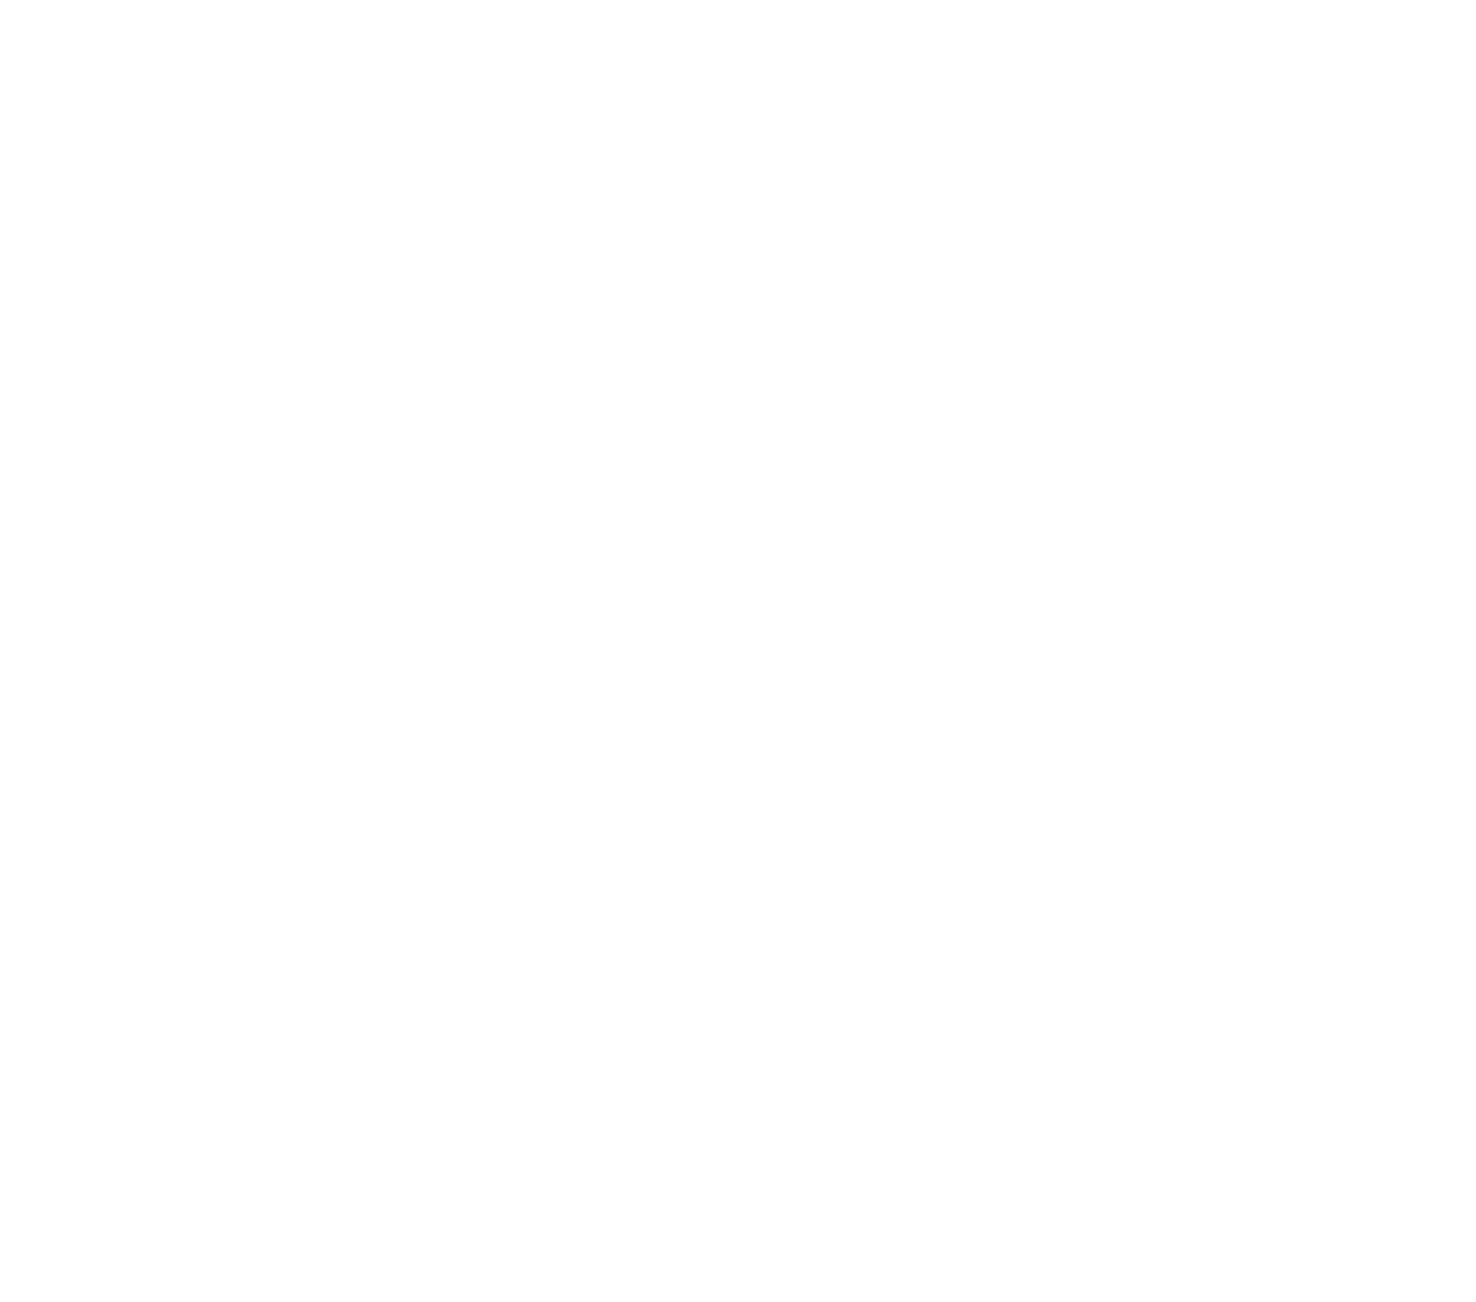 8664 – 07